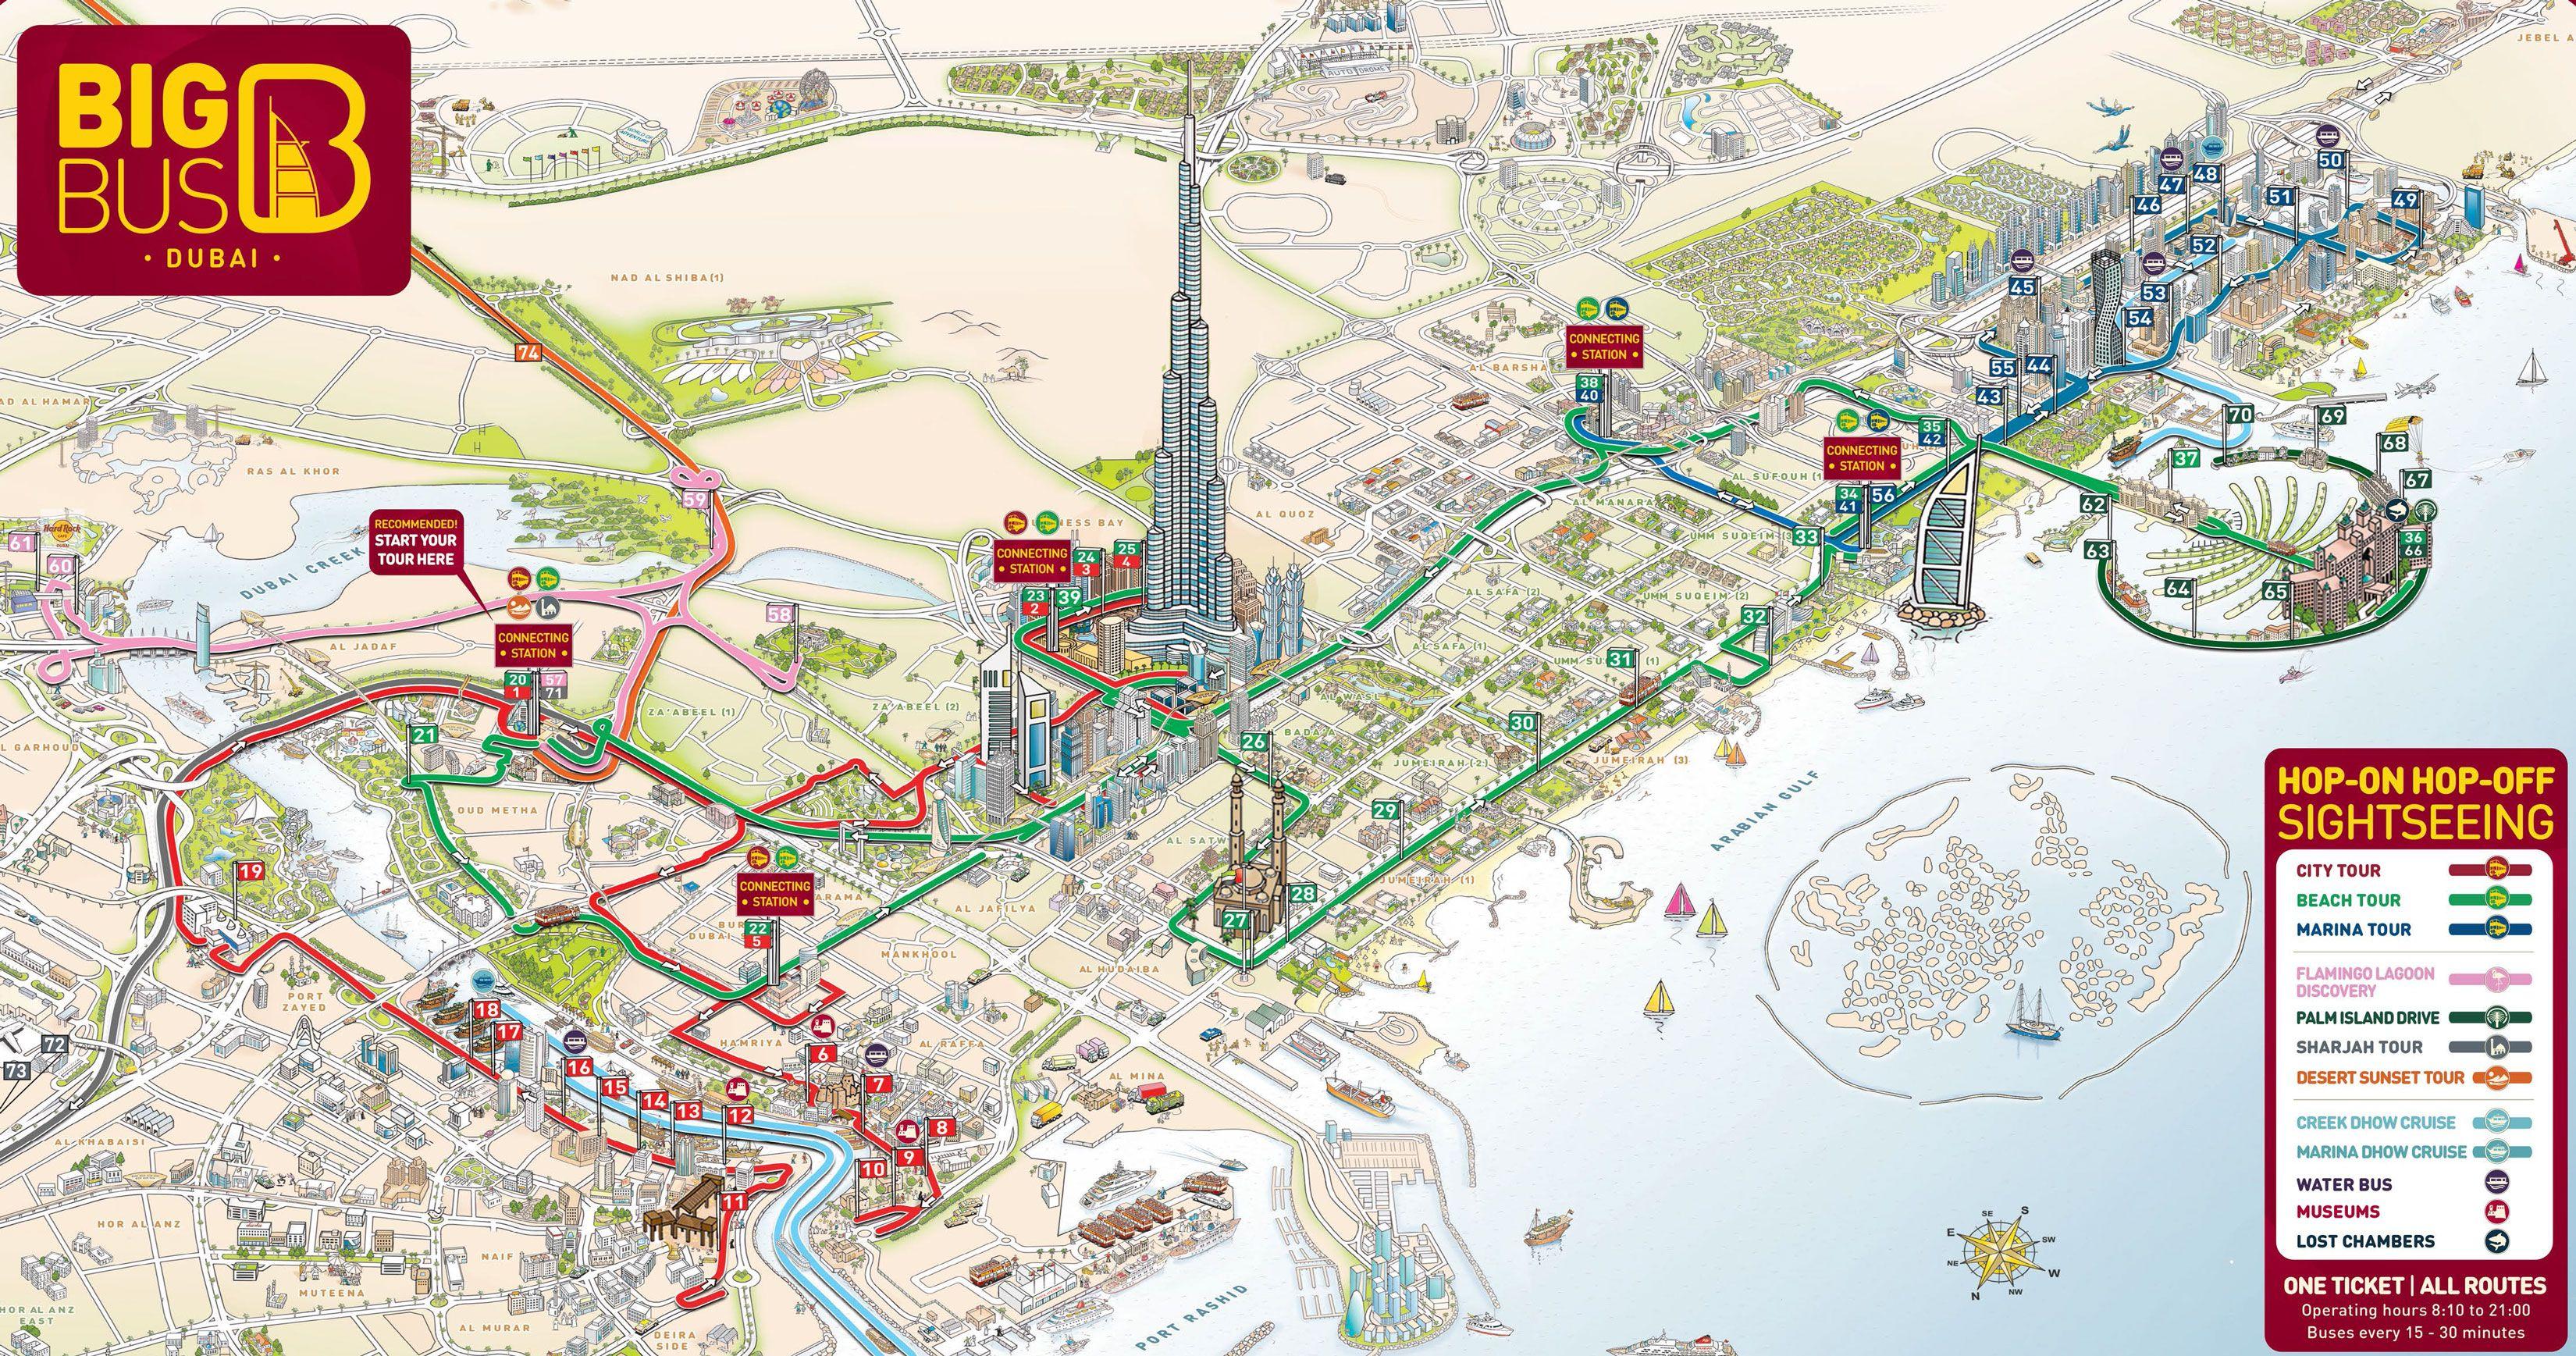 Map of Dubai hop on hop off bus tour with Big Bus  Matkustaminen